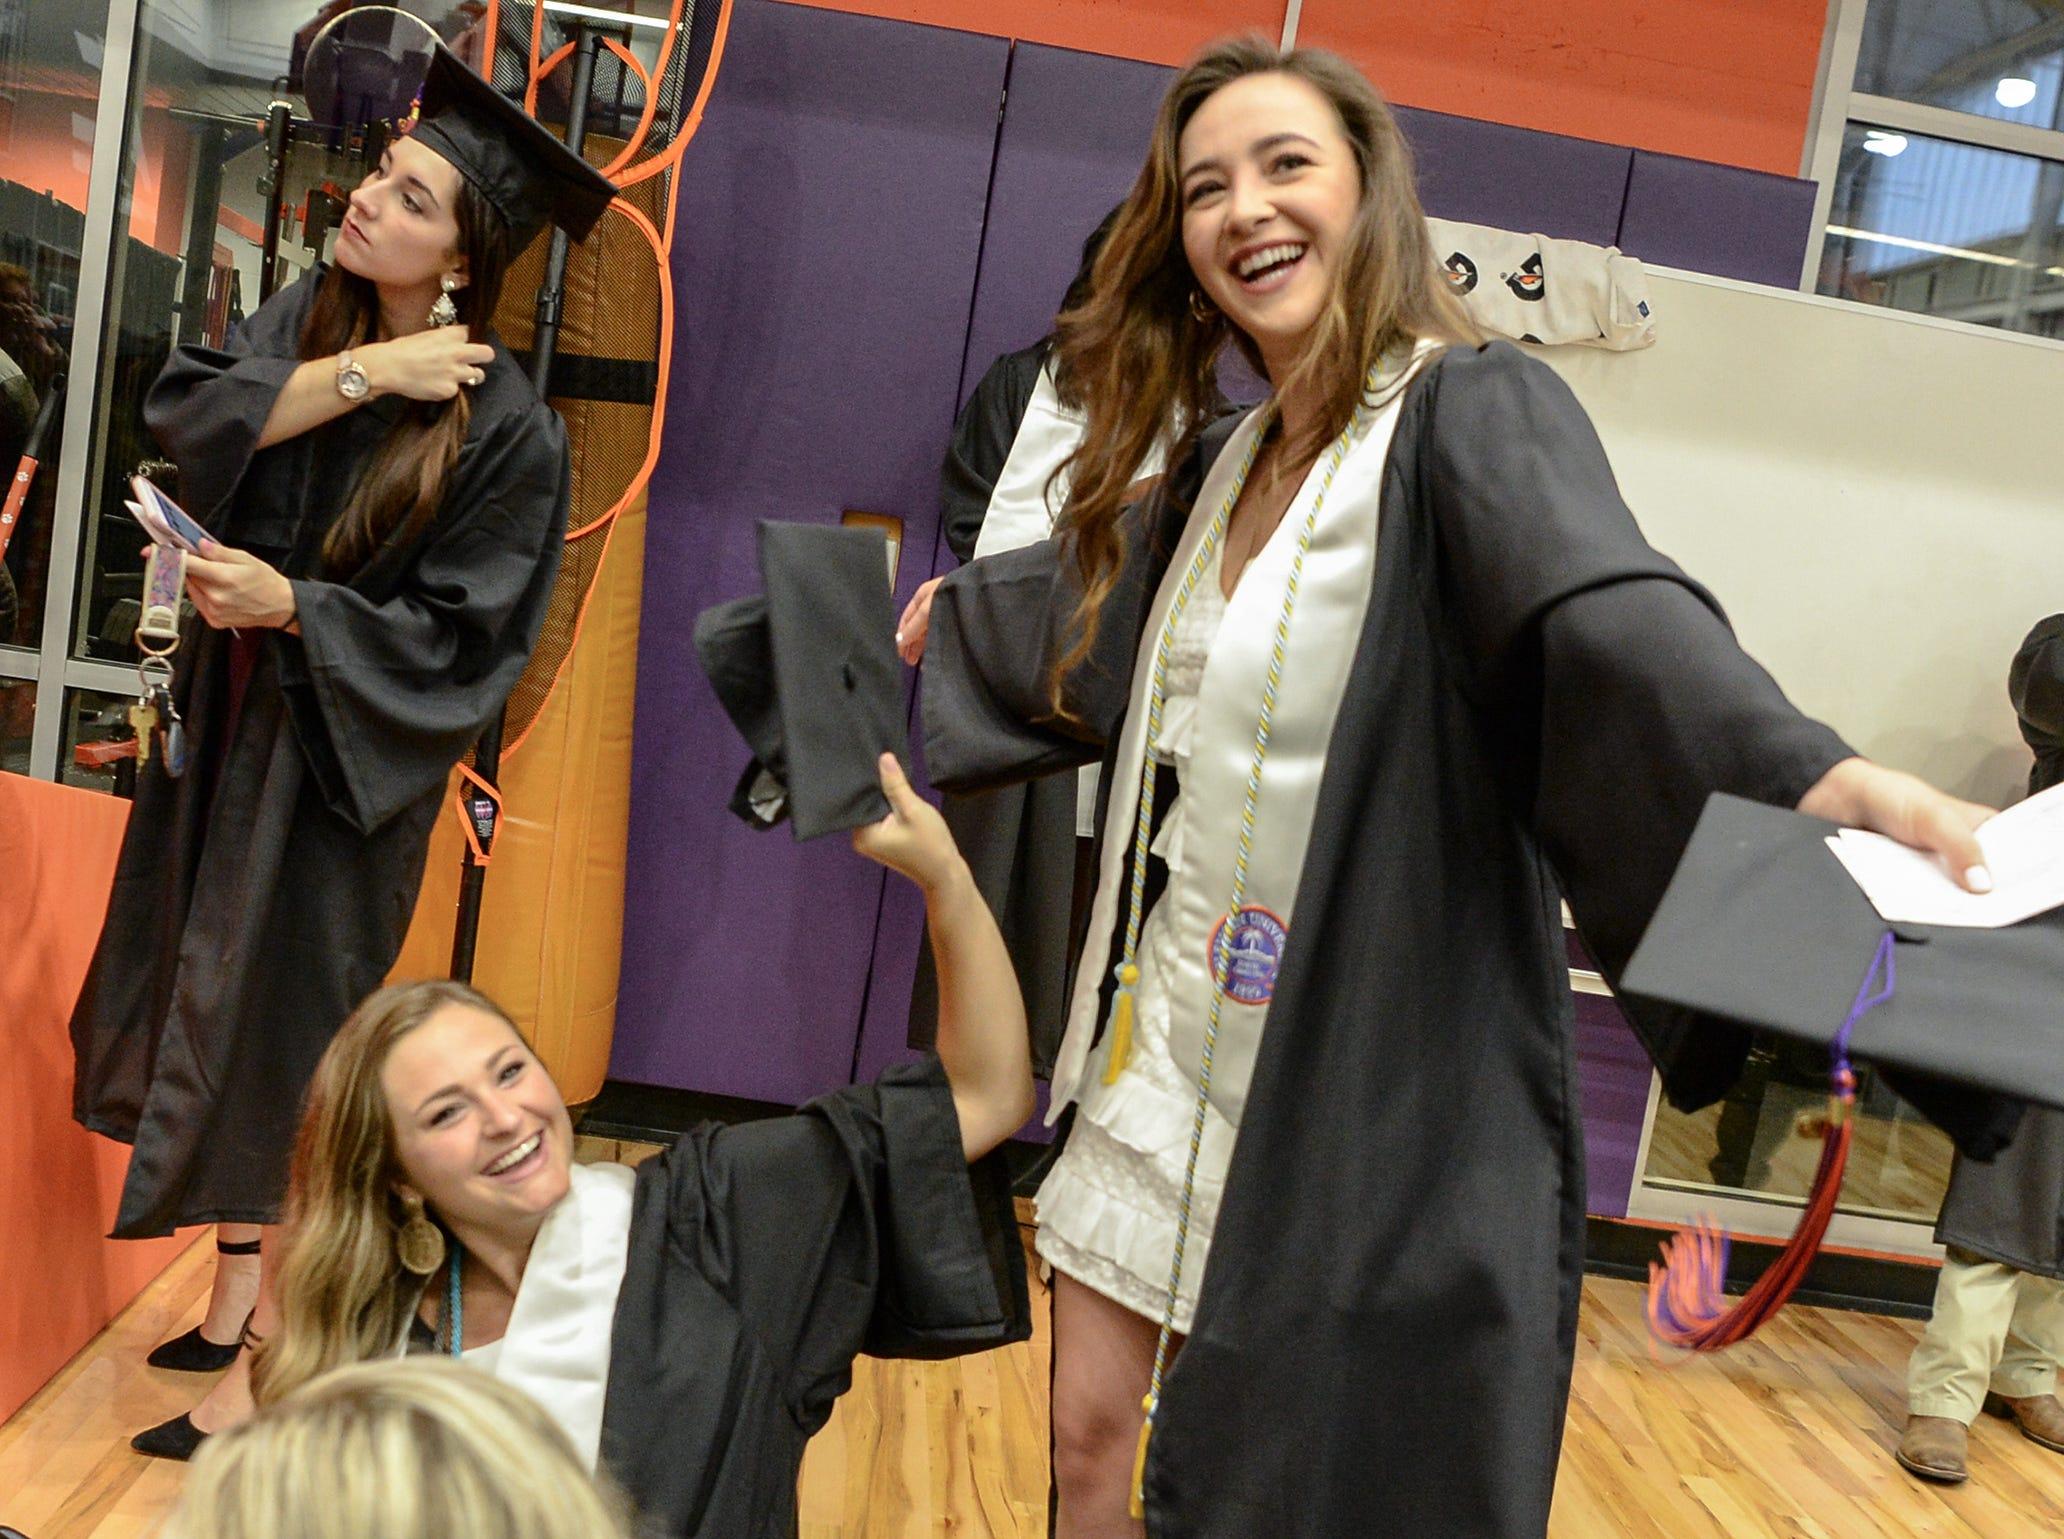 Emily Wessinger, left, cools off Jordan Kahn, right, with her cap before Clemson University commencement ceremonies in Littlejohn Coliseum in Clemson Friday, May 10, 2019.